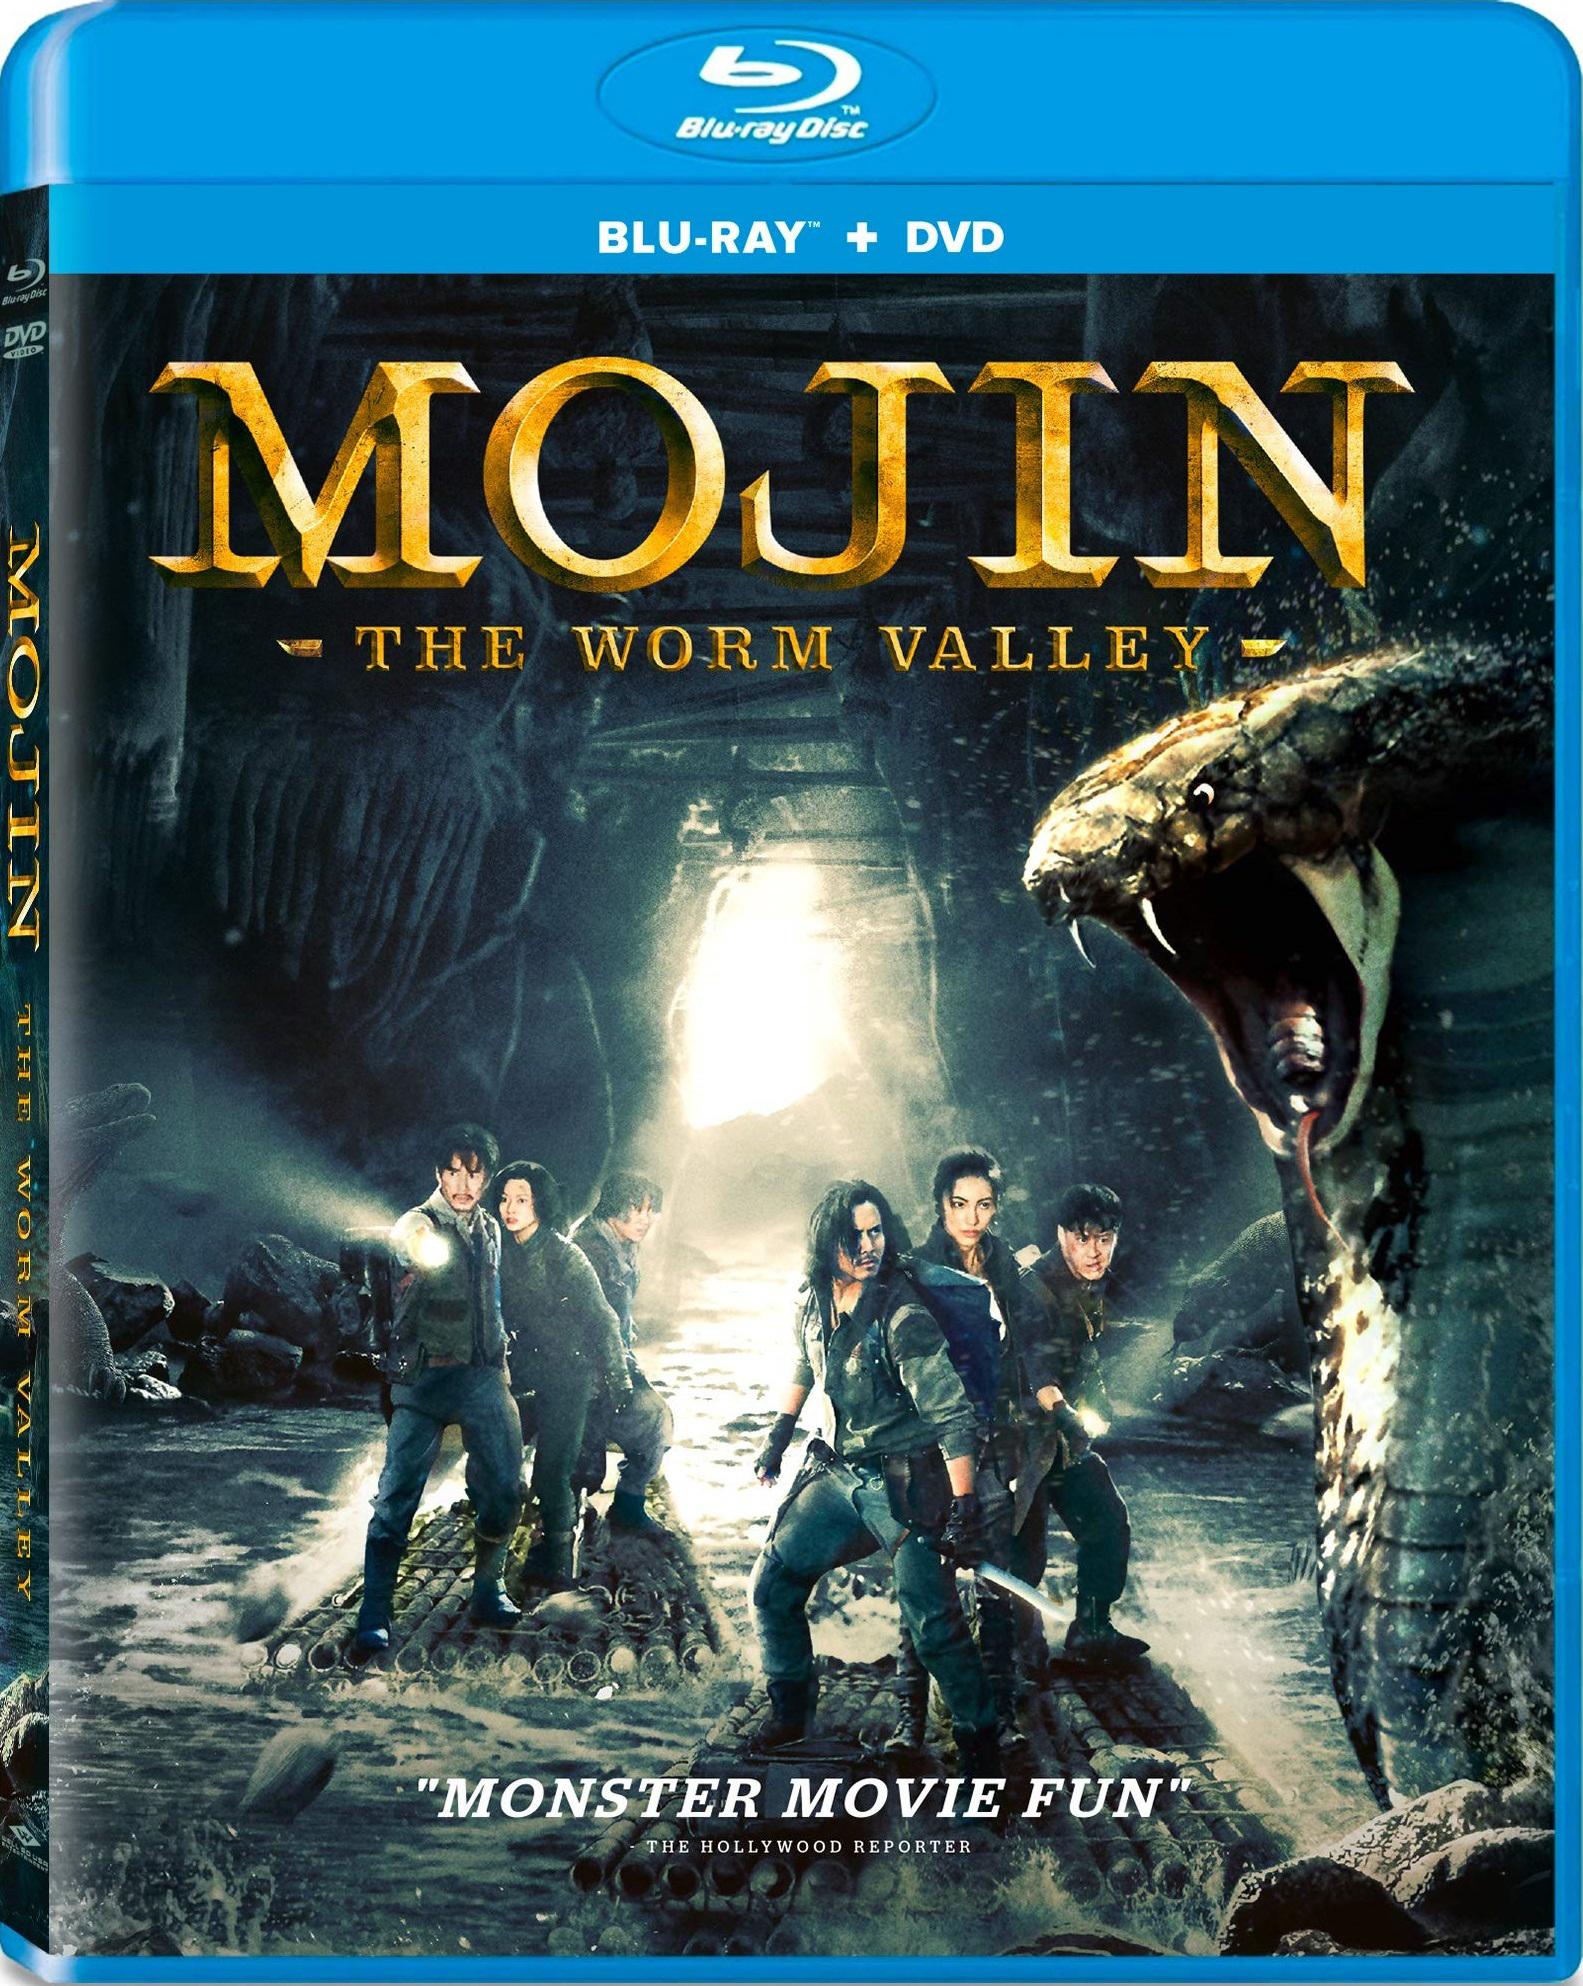 Mojin: The Worm Valley (Blu-ray)(Region Free)(Pre-order / Jul 9)